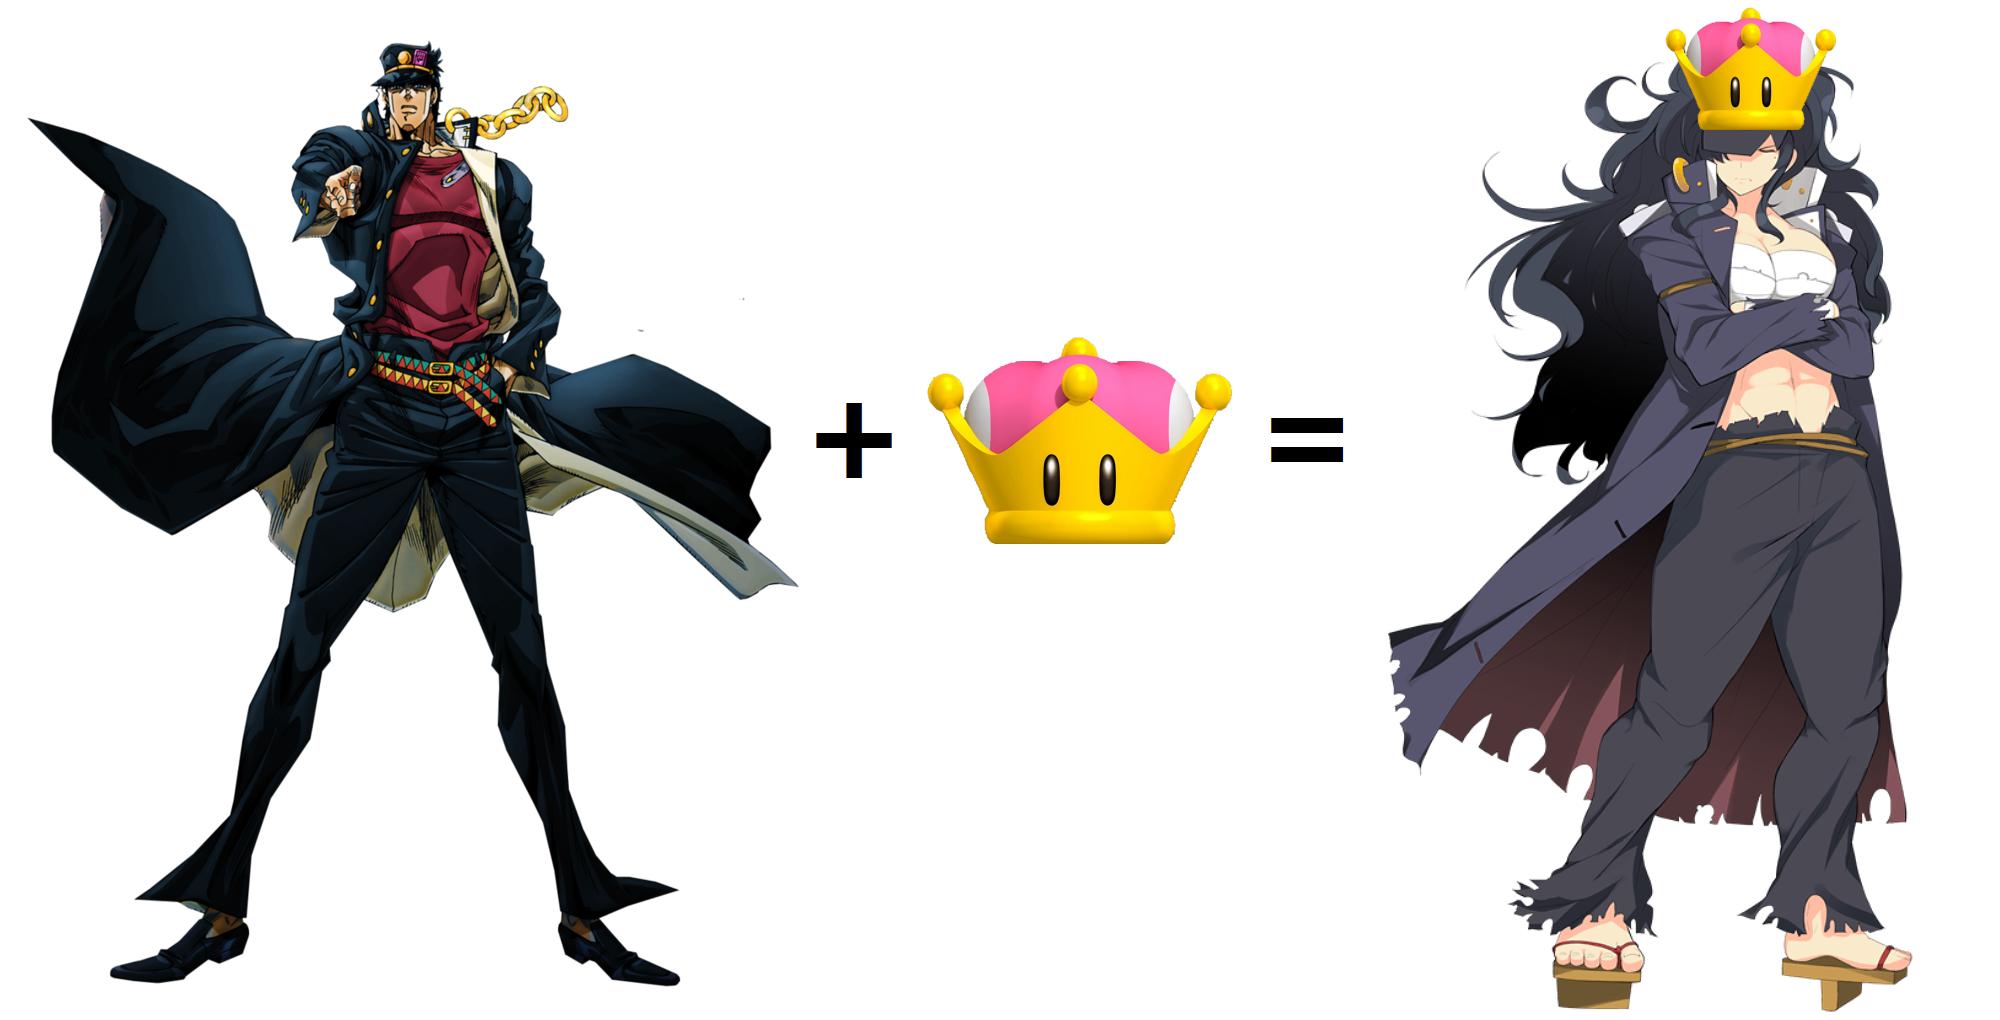 Jotaro Kujo Version Peachette Super Crown Jotaro Kujo Know Your Meme Super